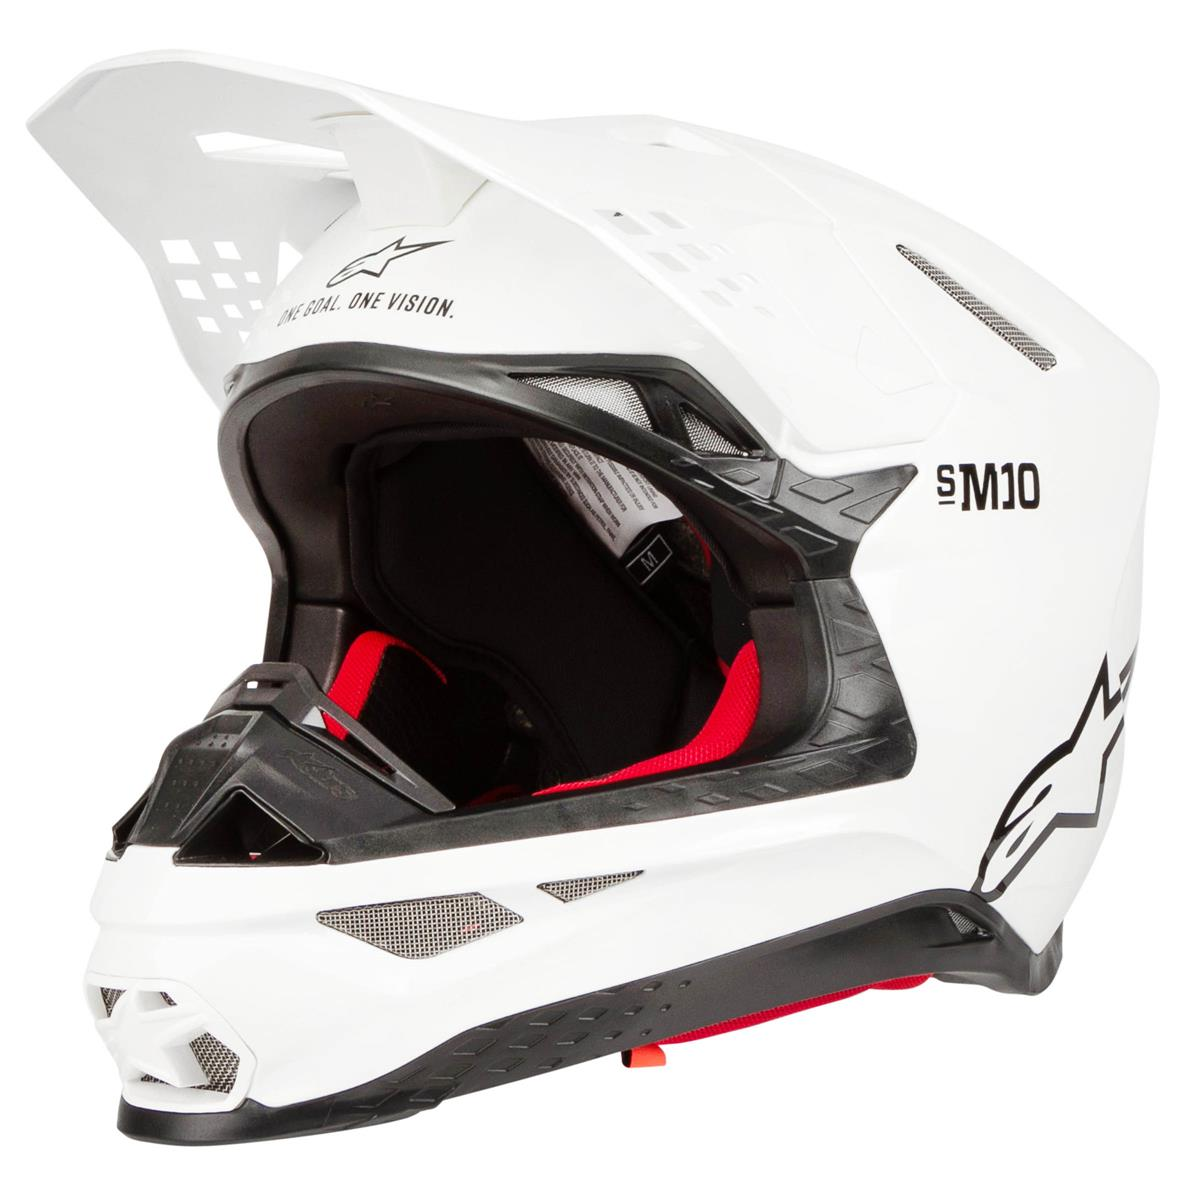 alpinestars-helm-helmet-supertech-s-m10-1 (4)